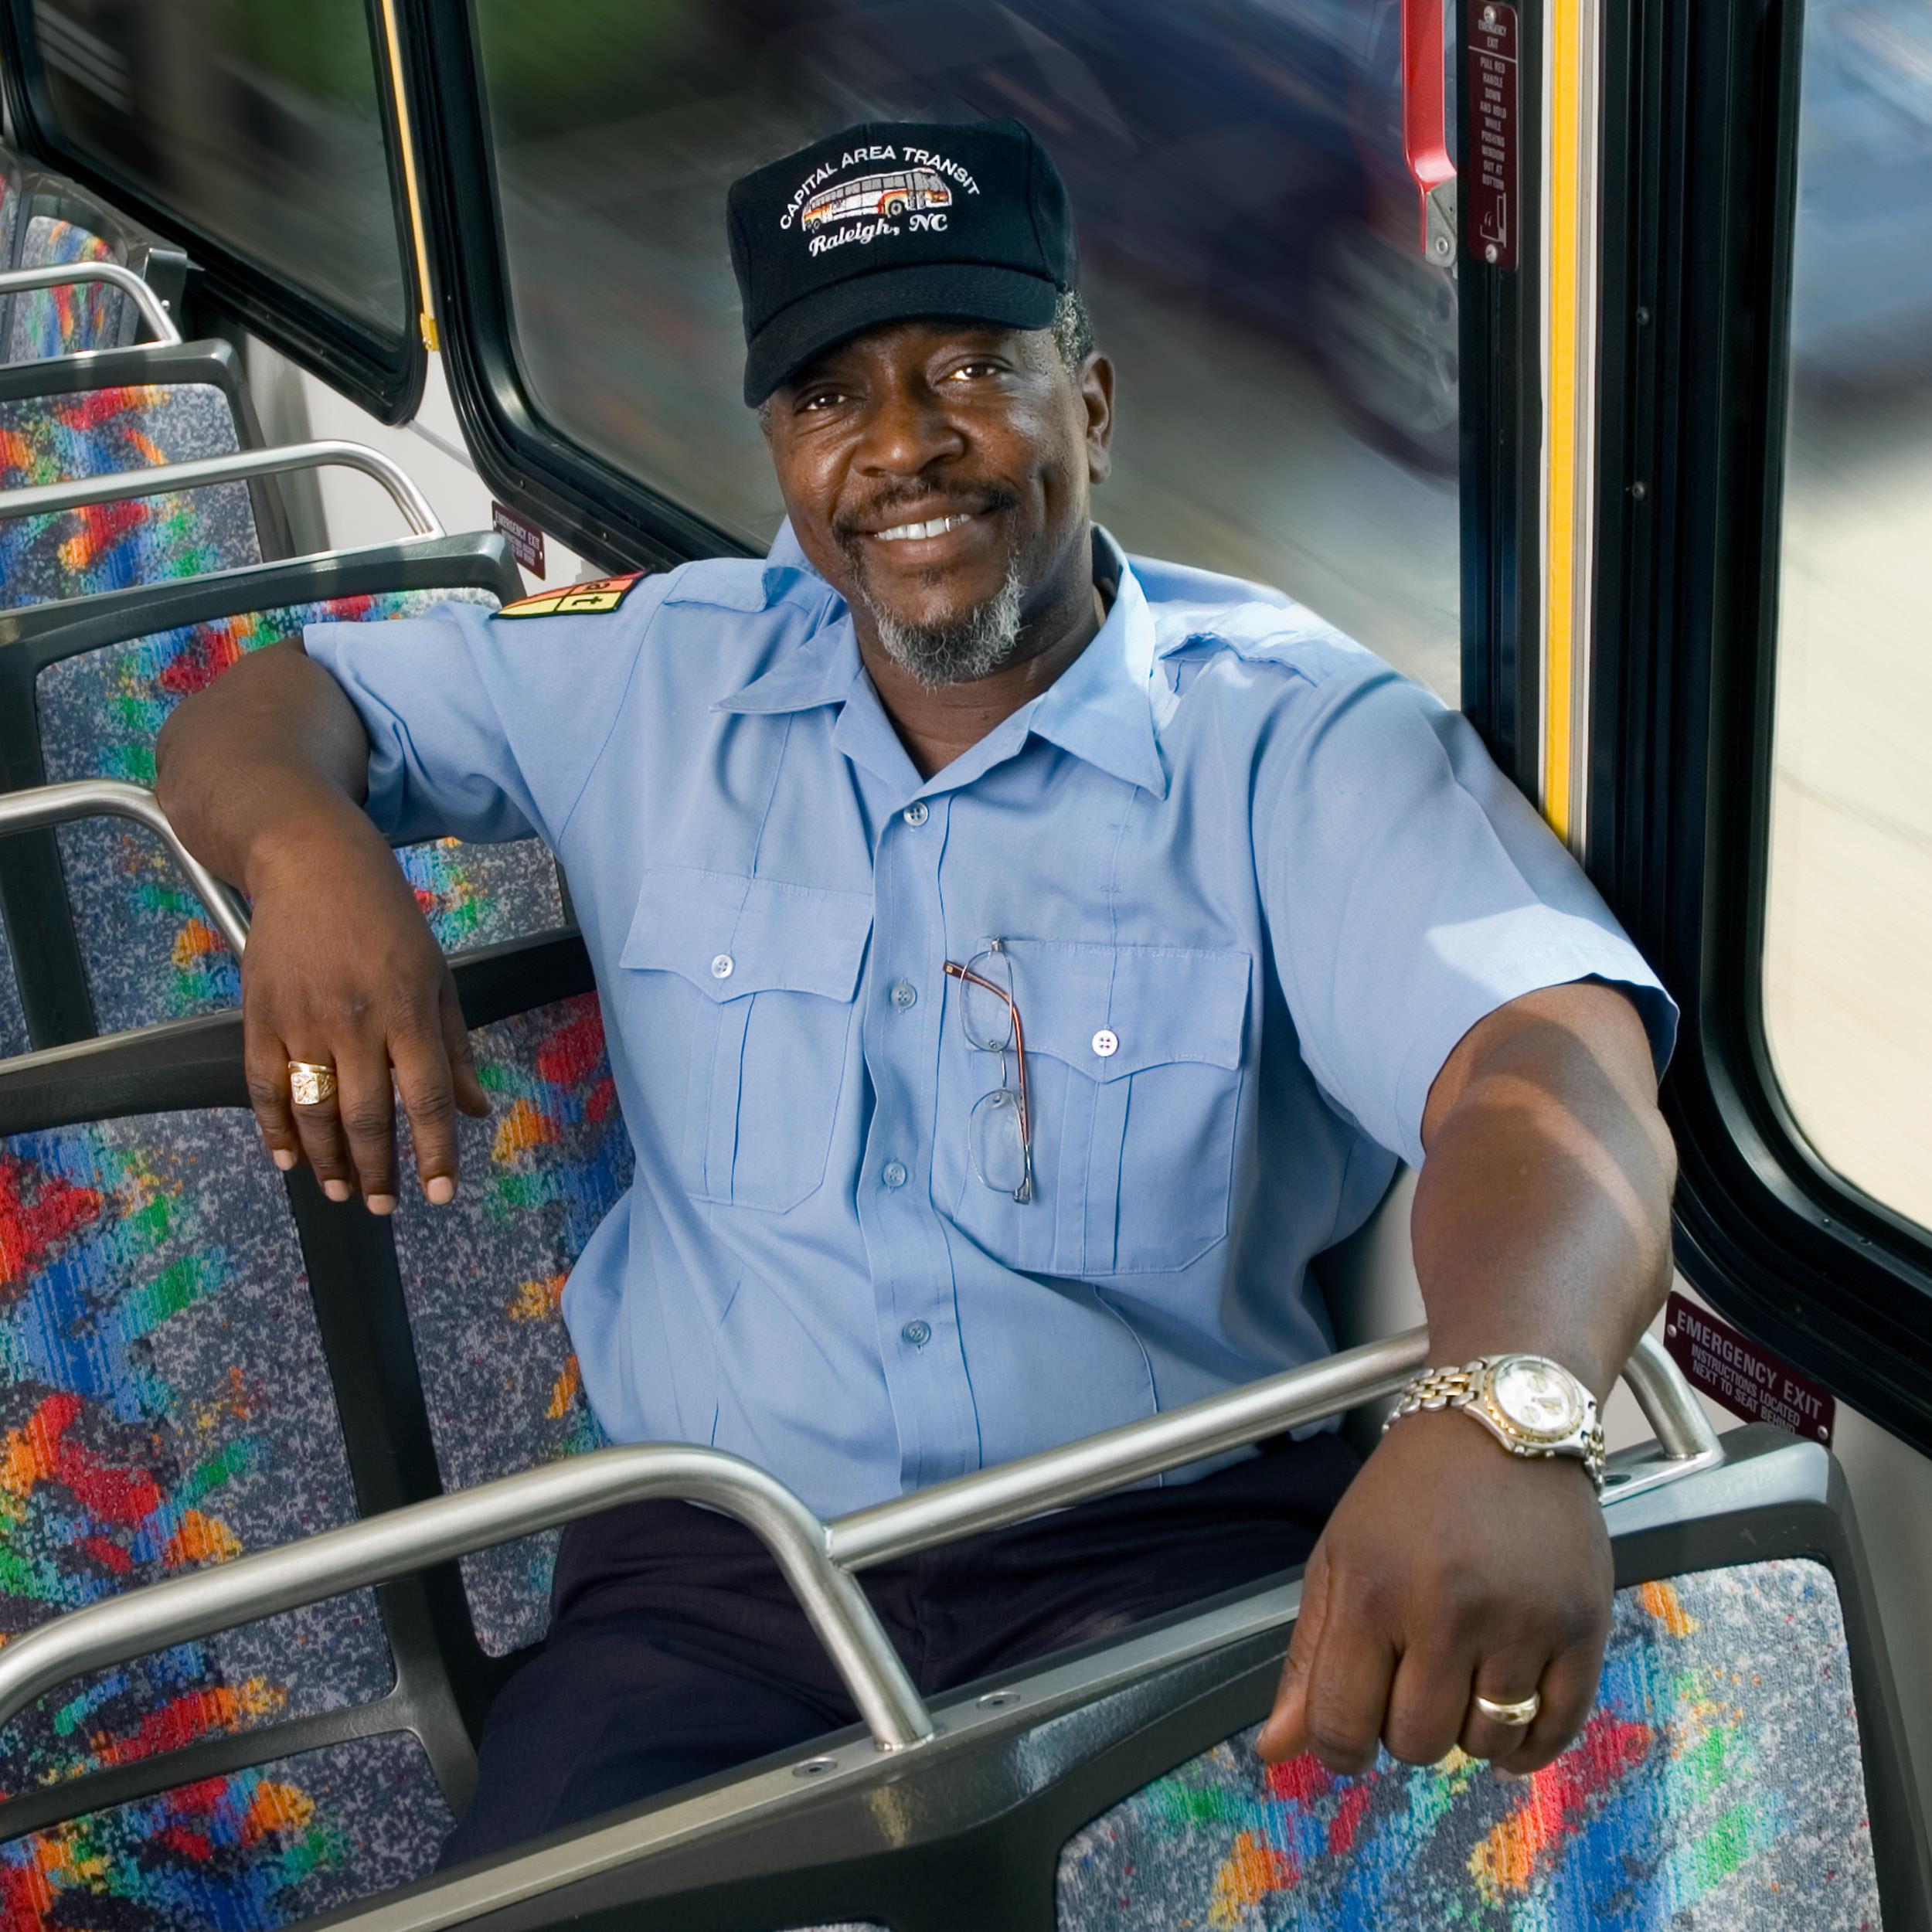 smart commute bus driver.jpg